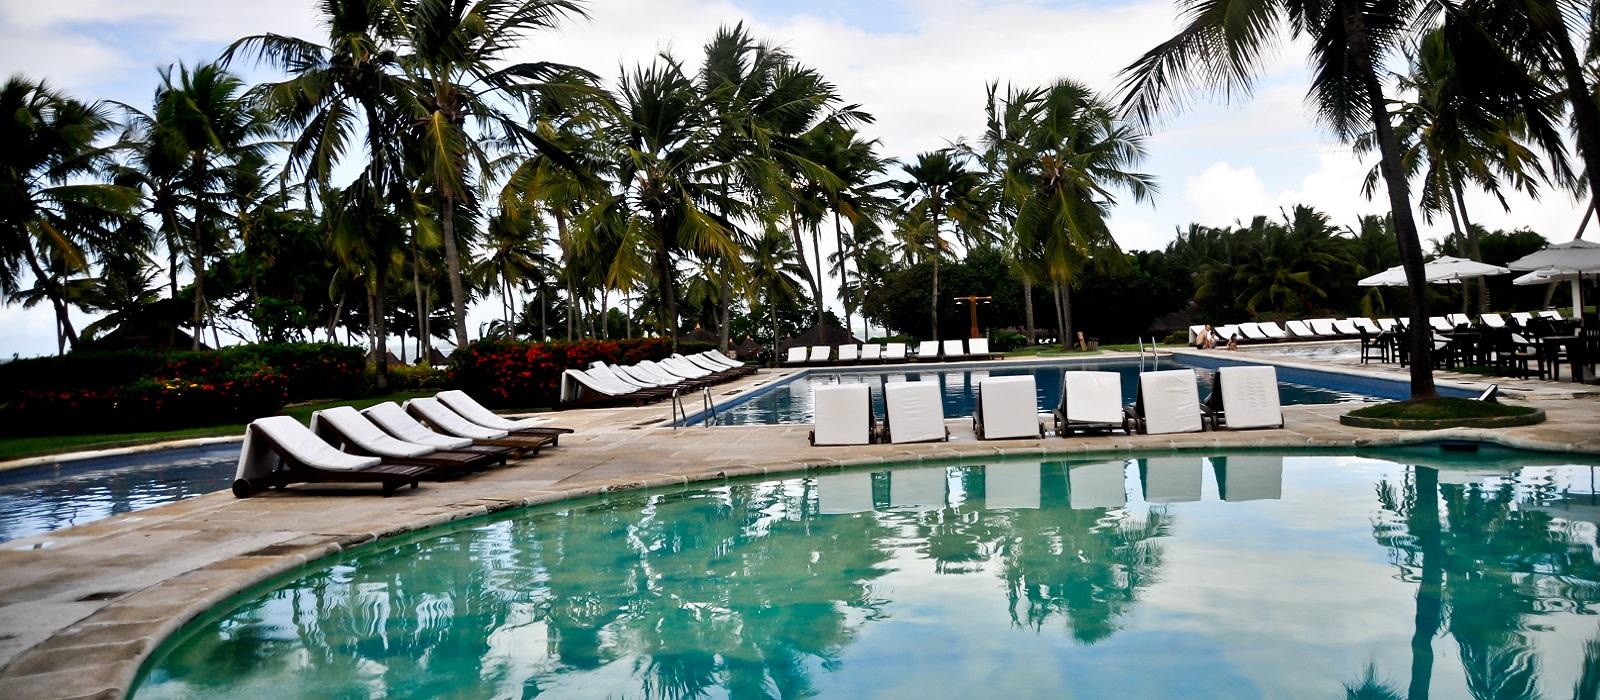 Hotel Tivoli Ecoresort Praia do Forte Brasilien